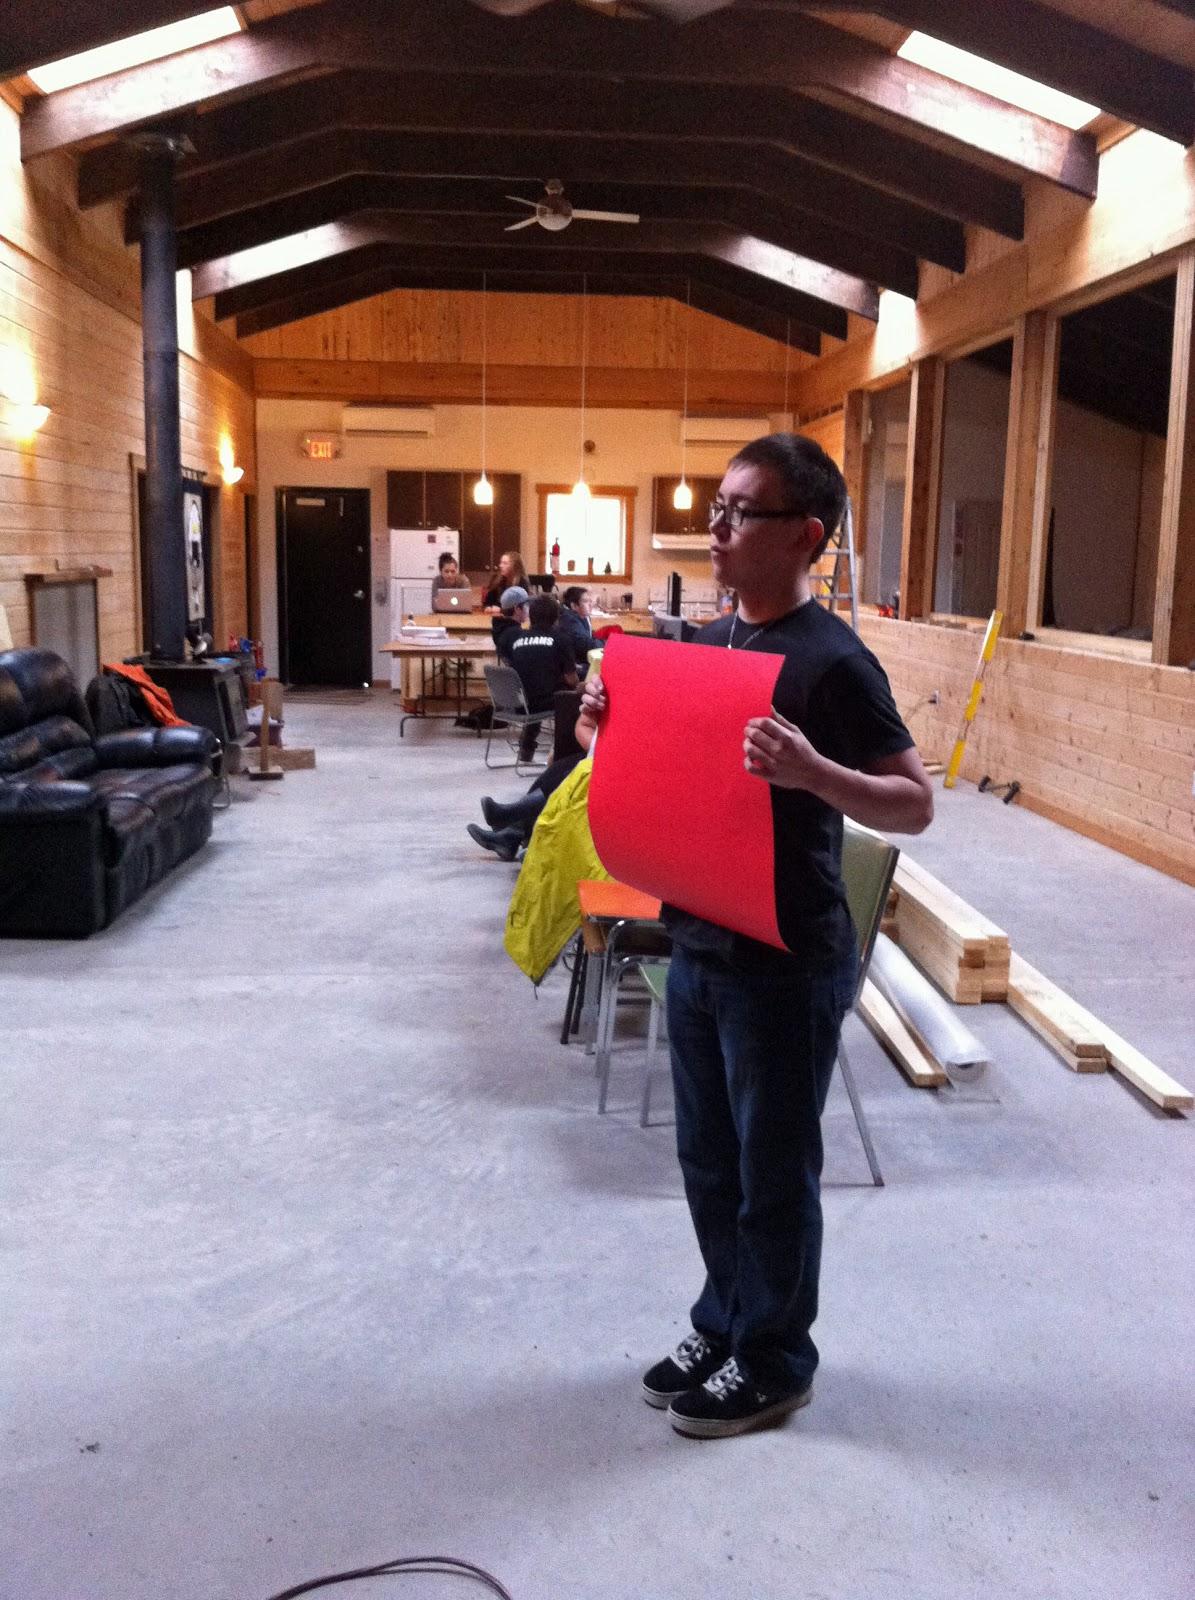 Damian creates his scene